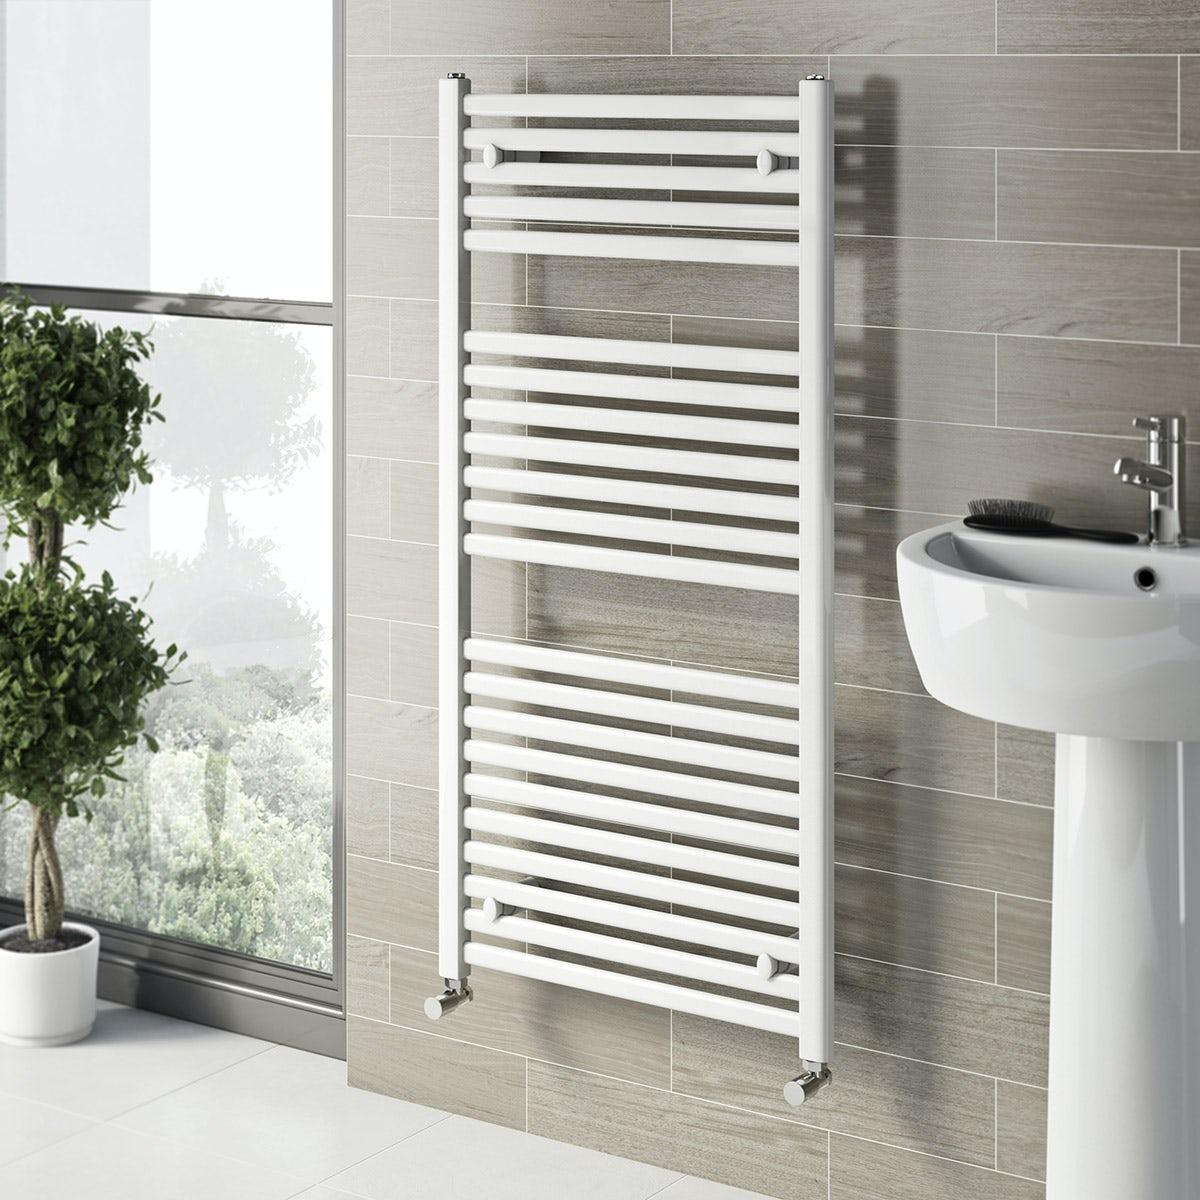 White Bathroom Radiators: White Heated Towel Rail 1200 X 600